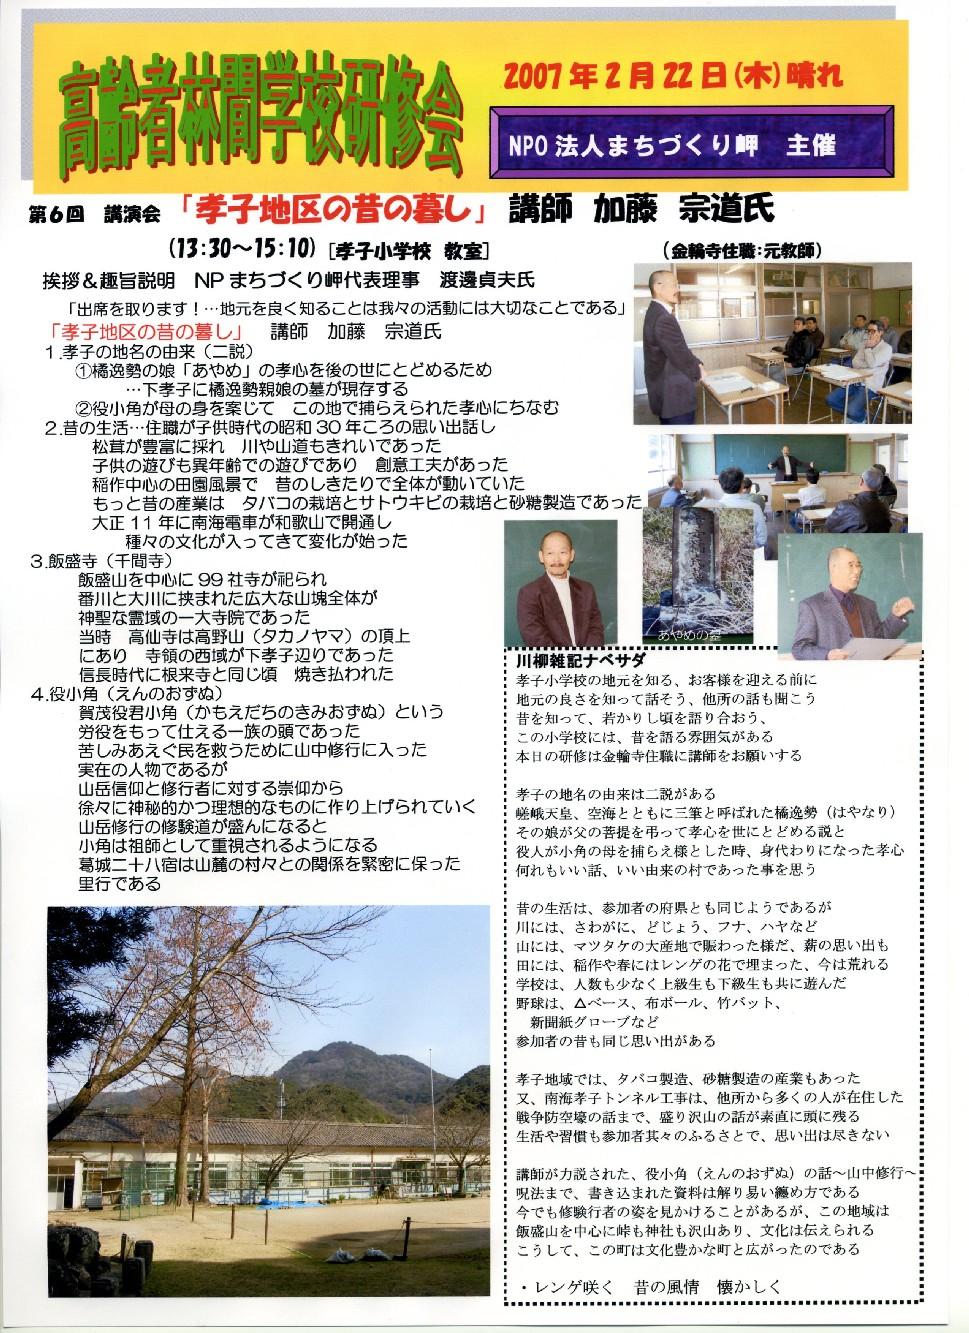 第6回 「高齢者林間学校研修会」…「孝子地区の昔の暮し」 _c0108460_19311868.jpg